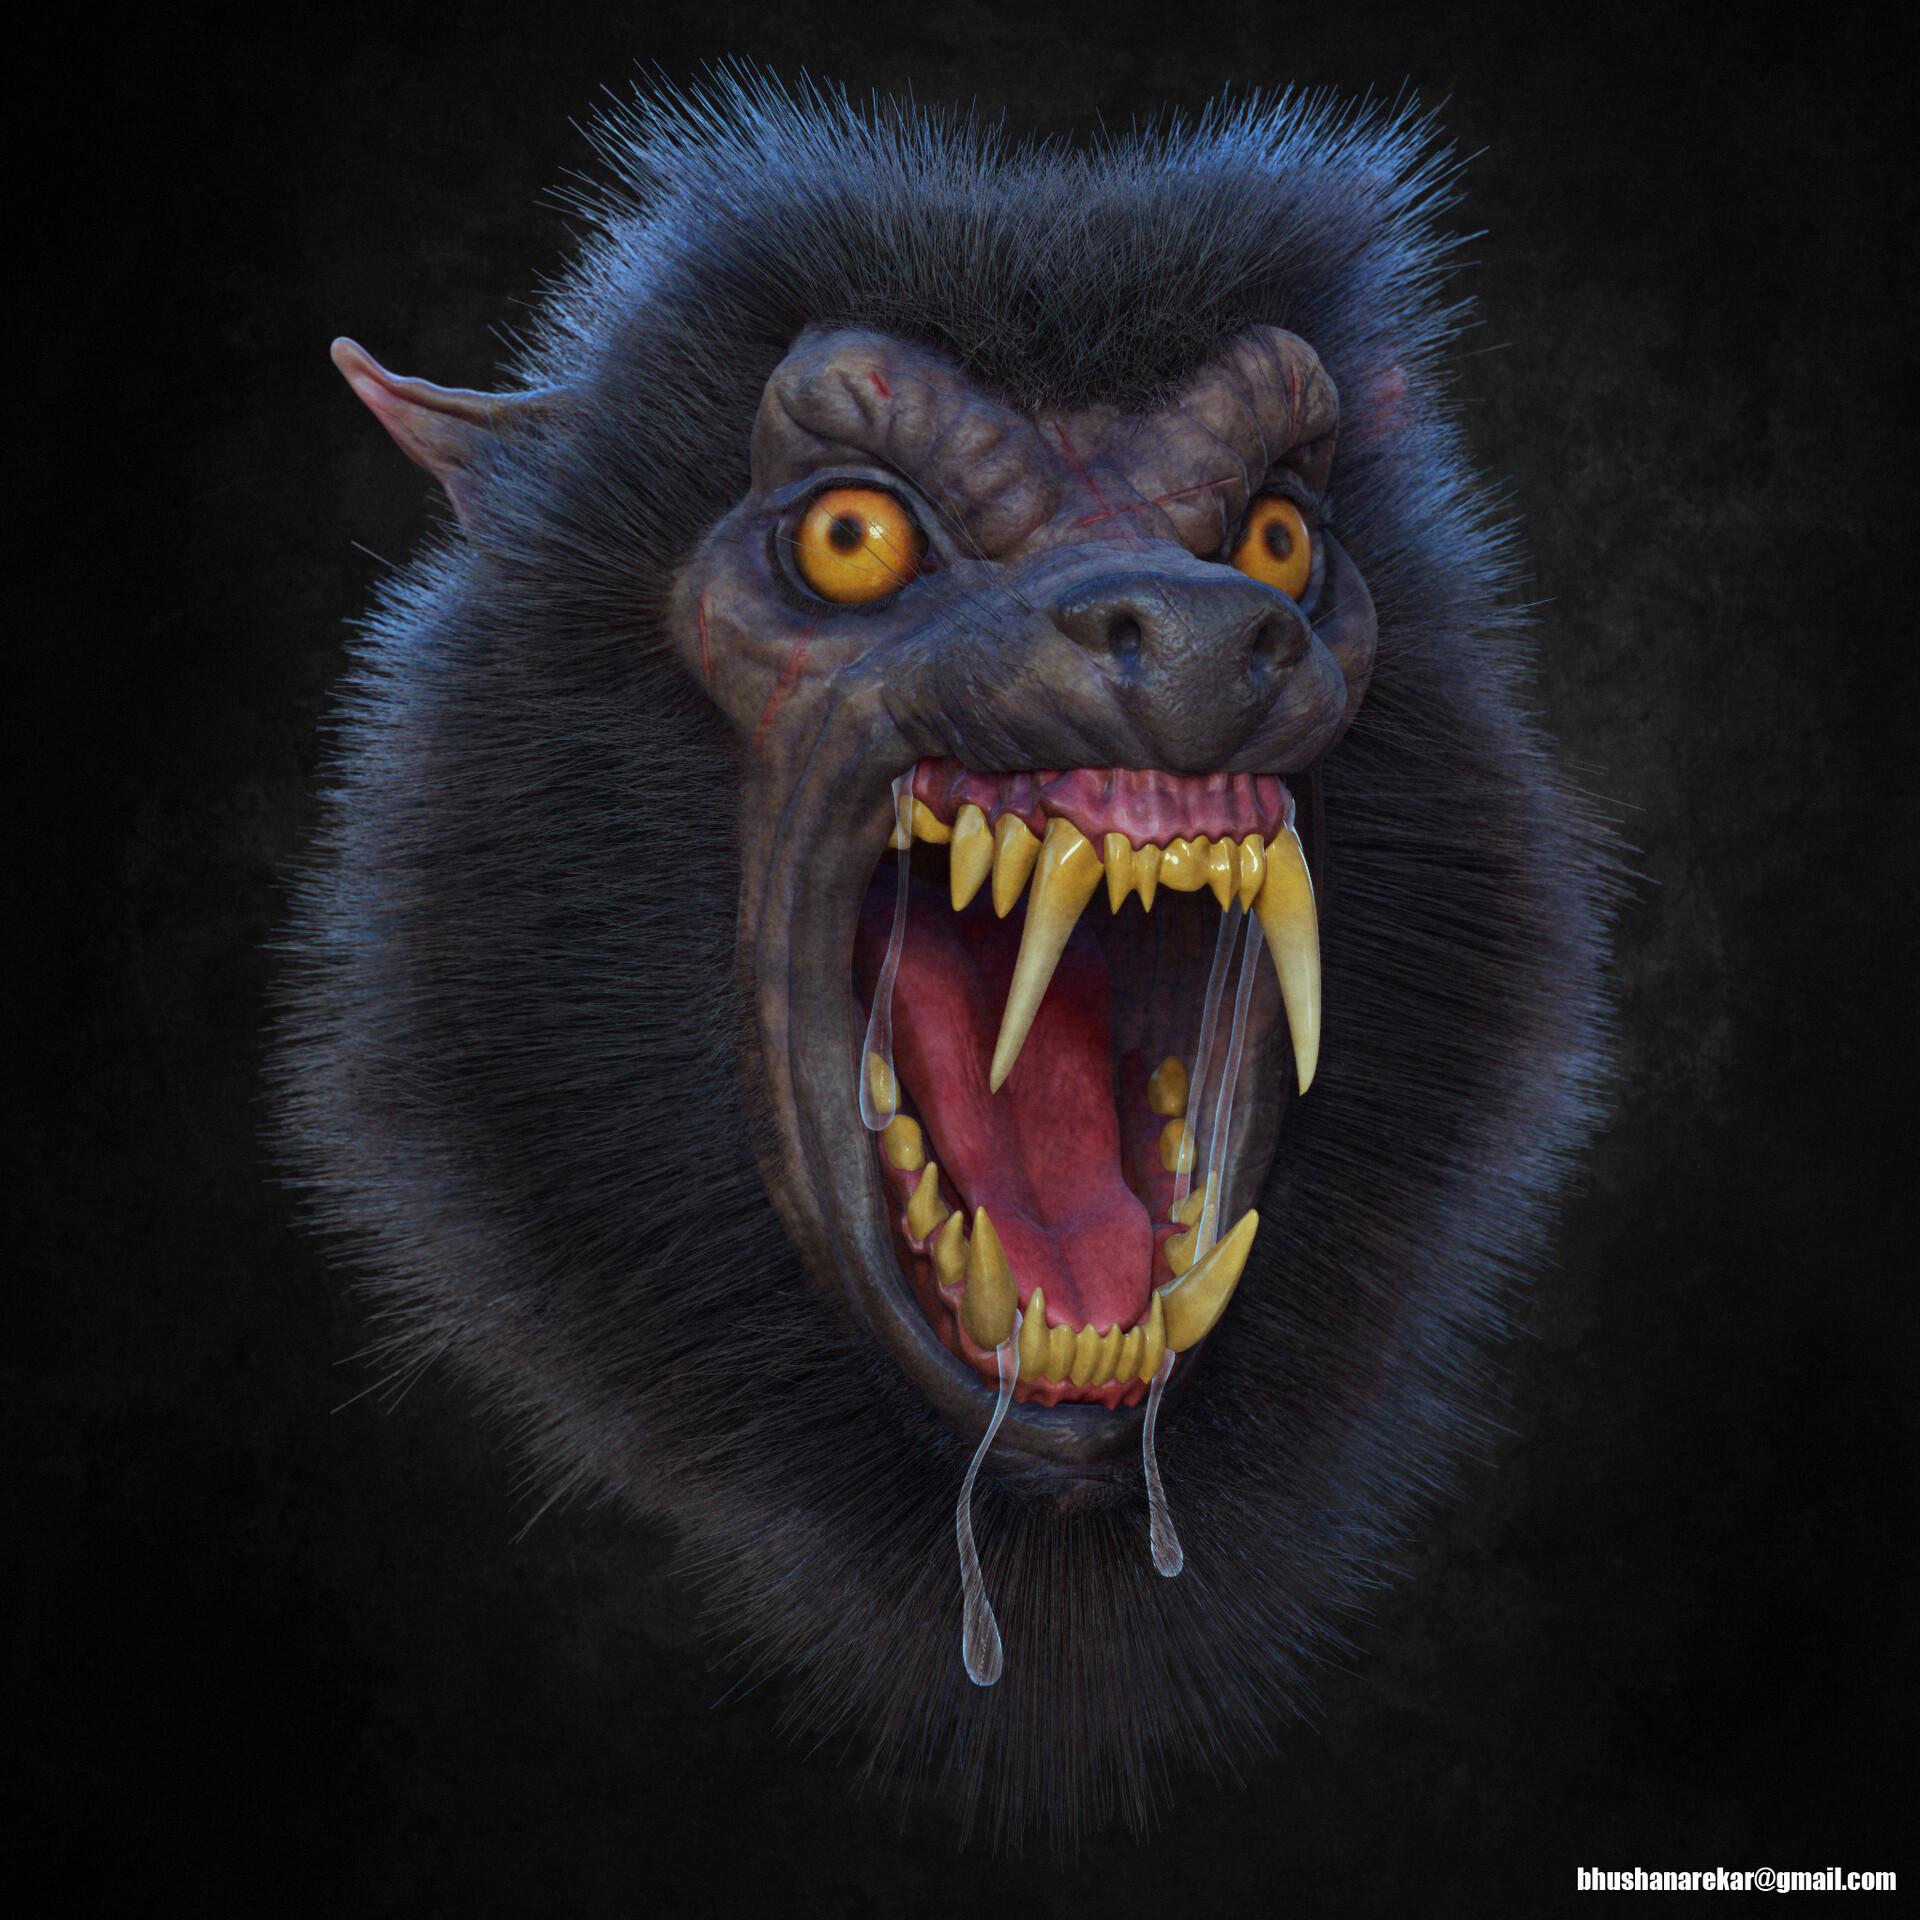 Bhushan arekar werewolf2